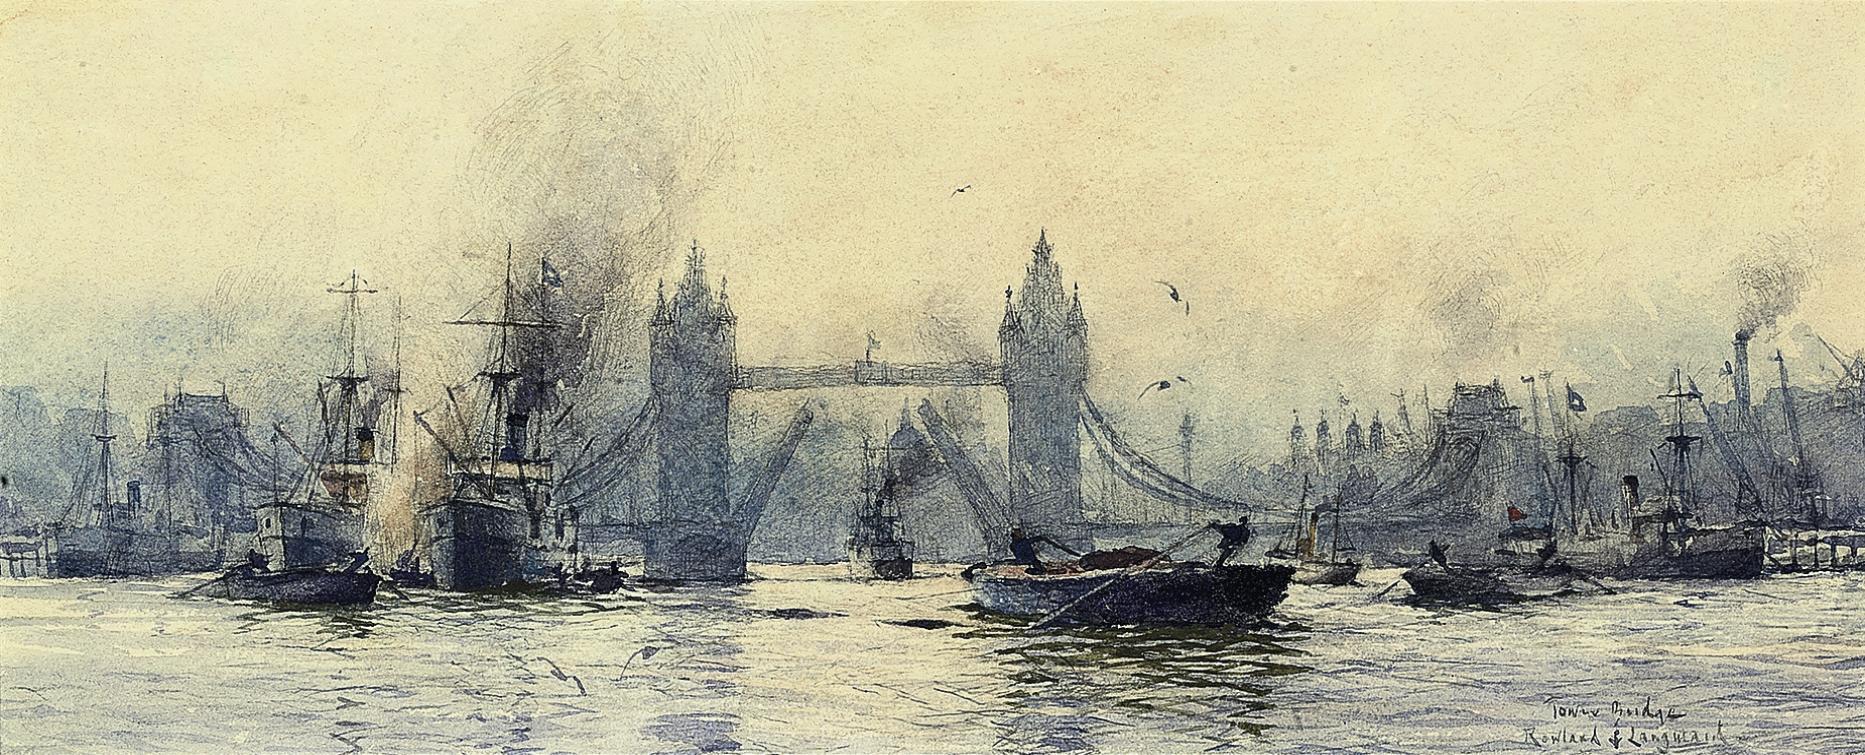 Bustling activity below Tower Bridge